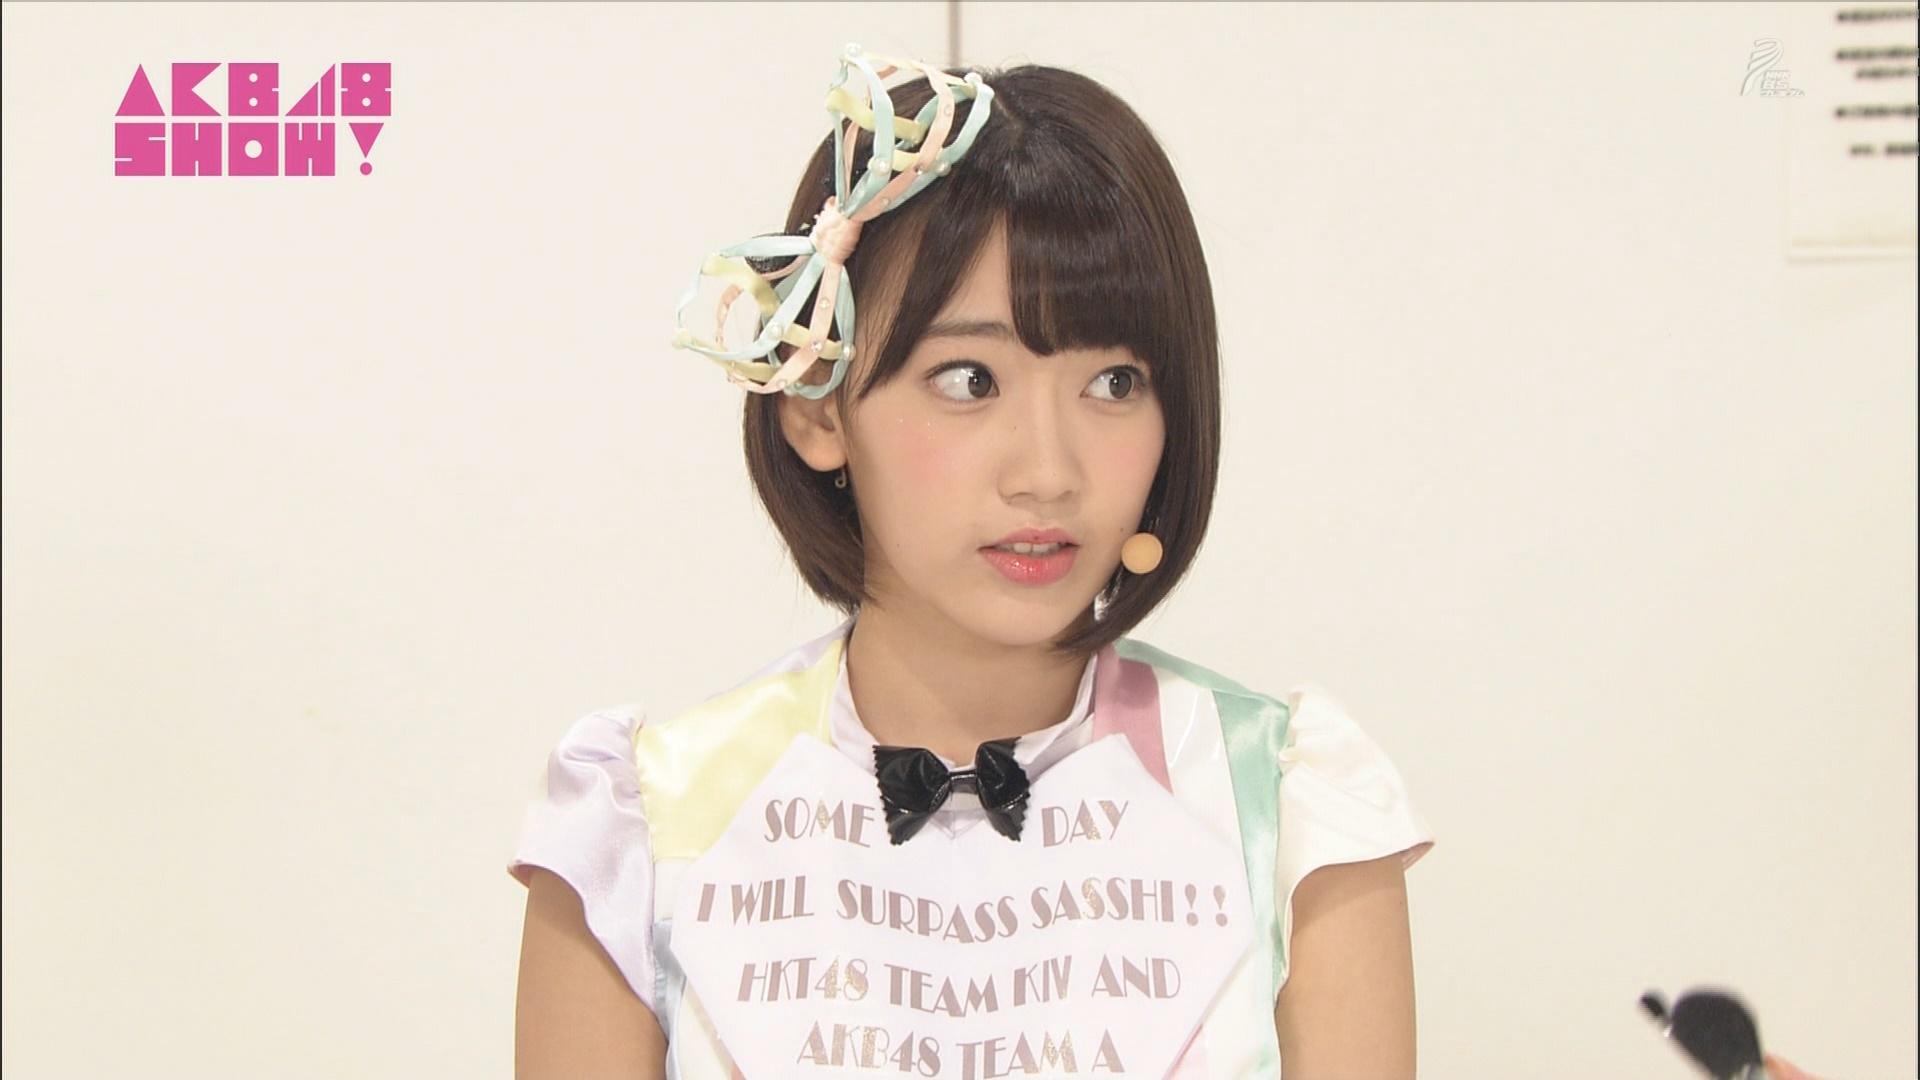 AKB48SHOW 心のプラカード 宮脇咲良 20140830 (1)